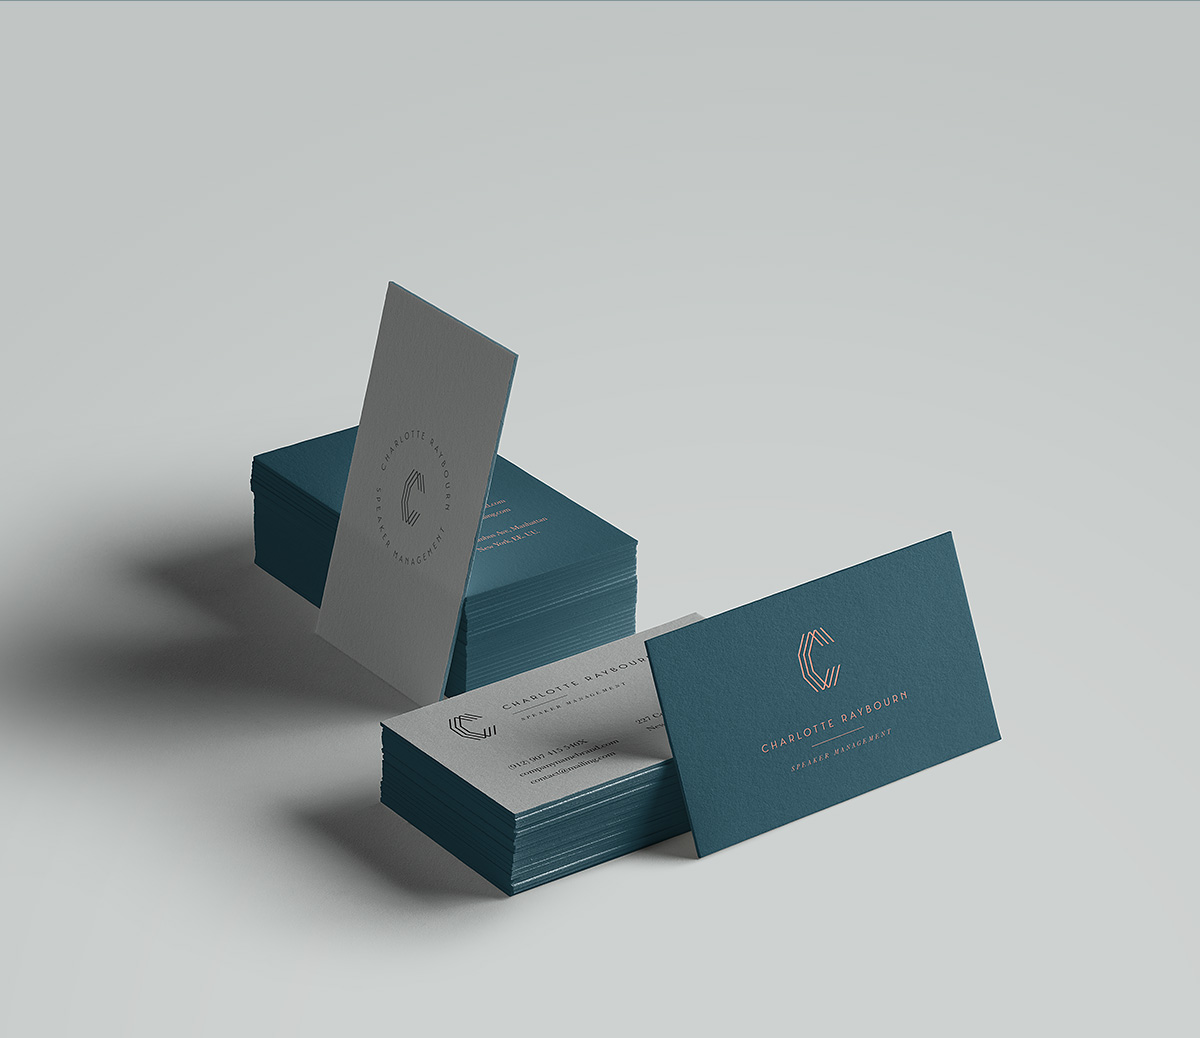 Simon's business cards